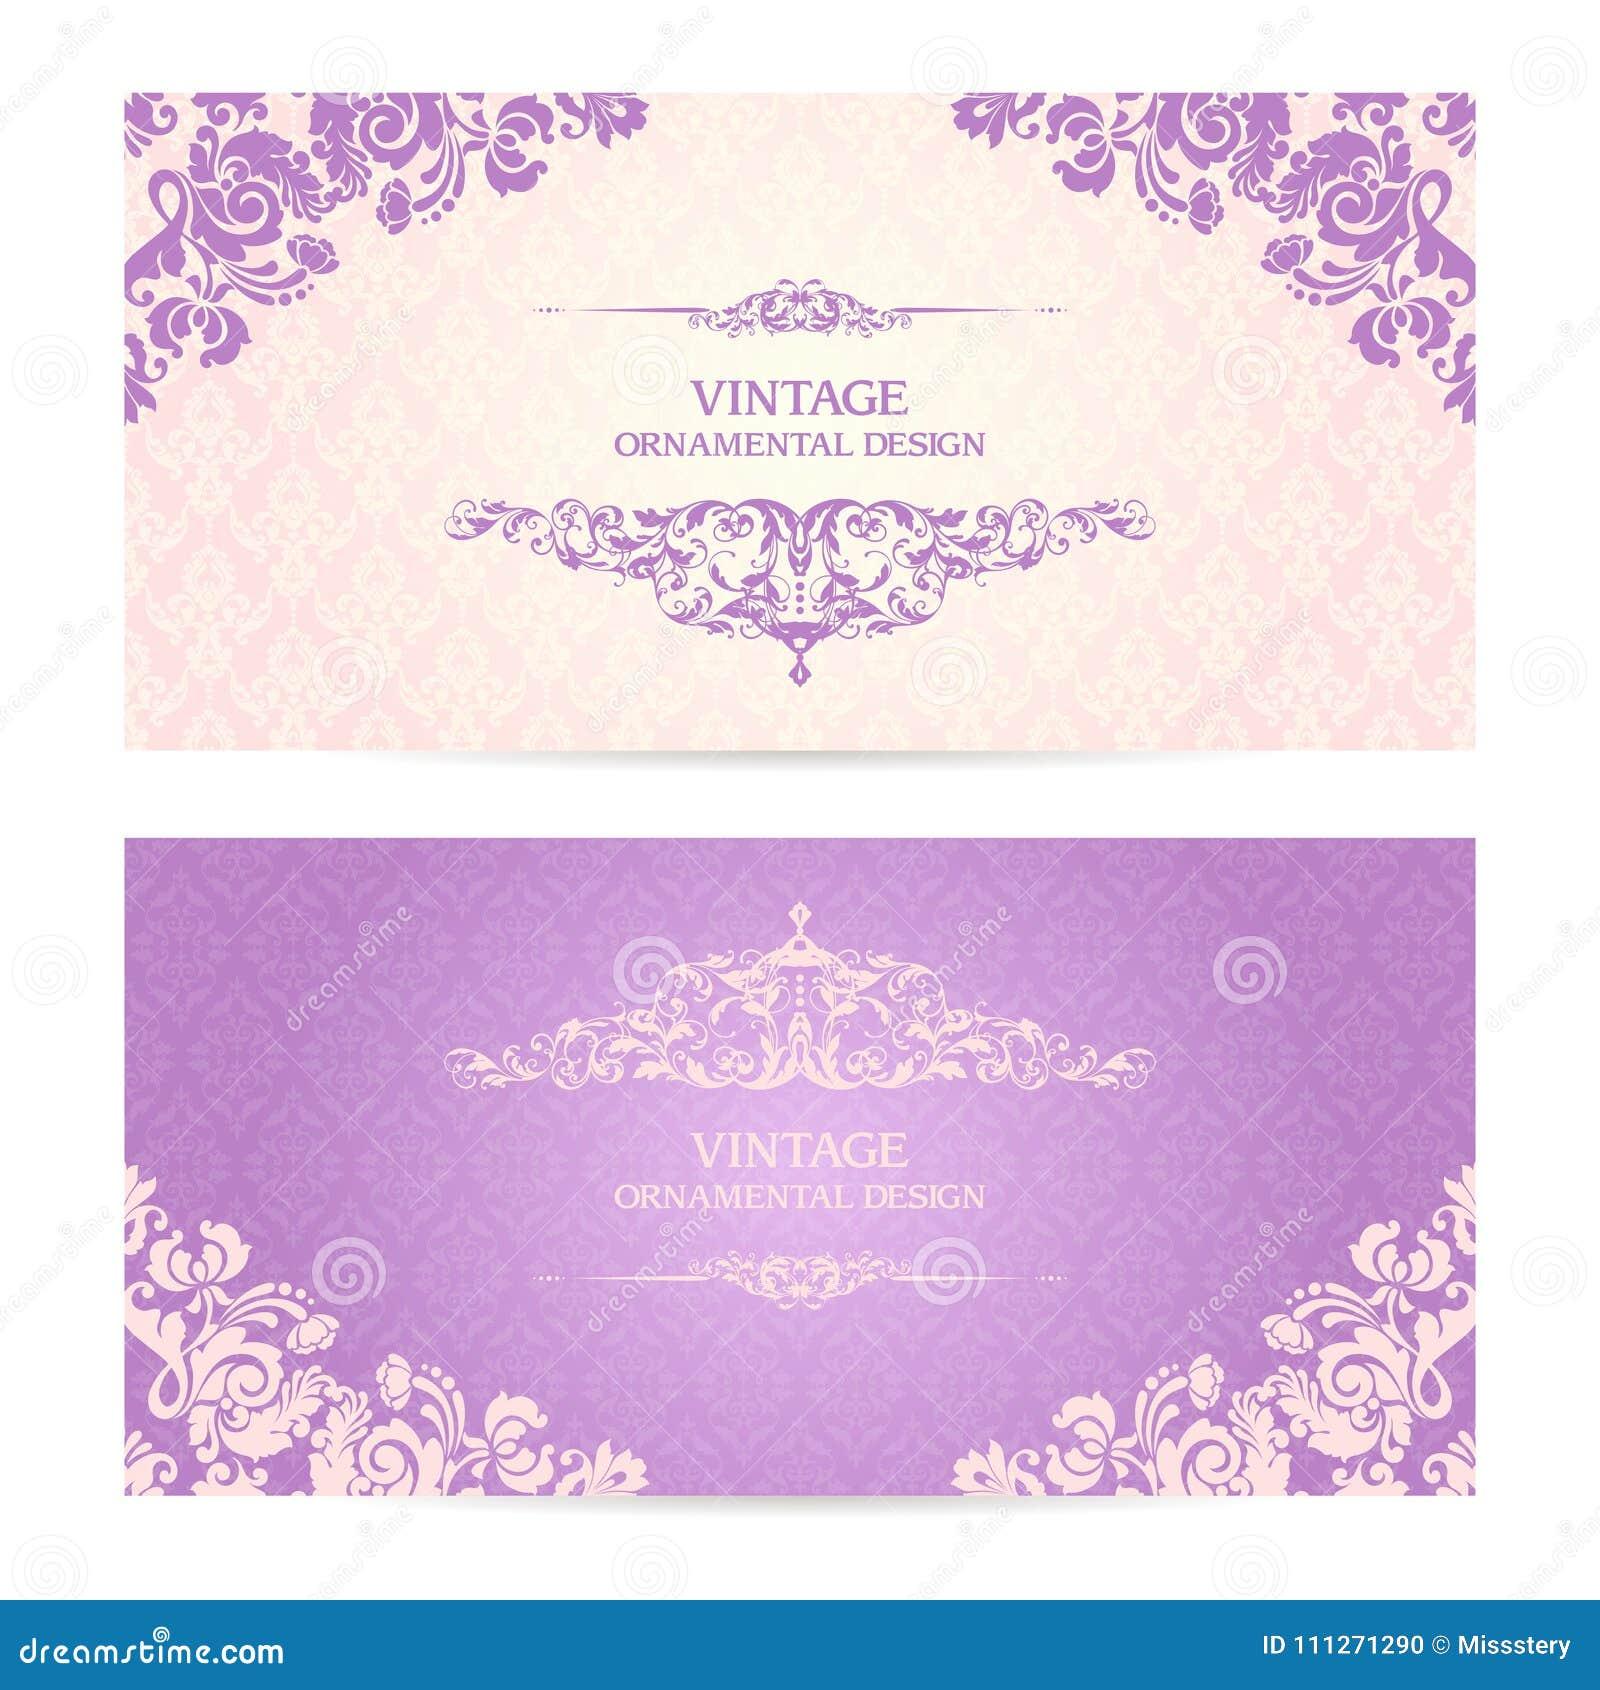 Vintage set of template ornamental borders and patterned background. Elegant lace wedding invitation design Greeting Card, banner.